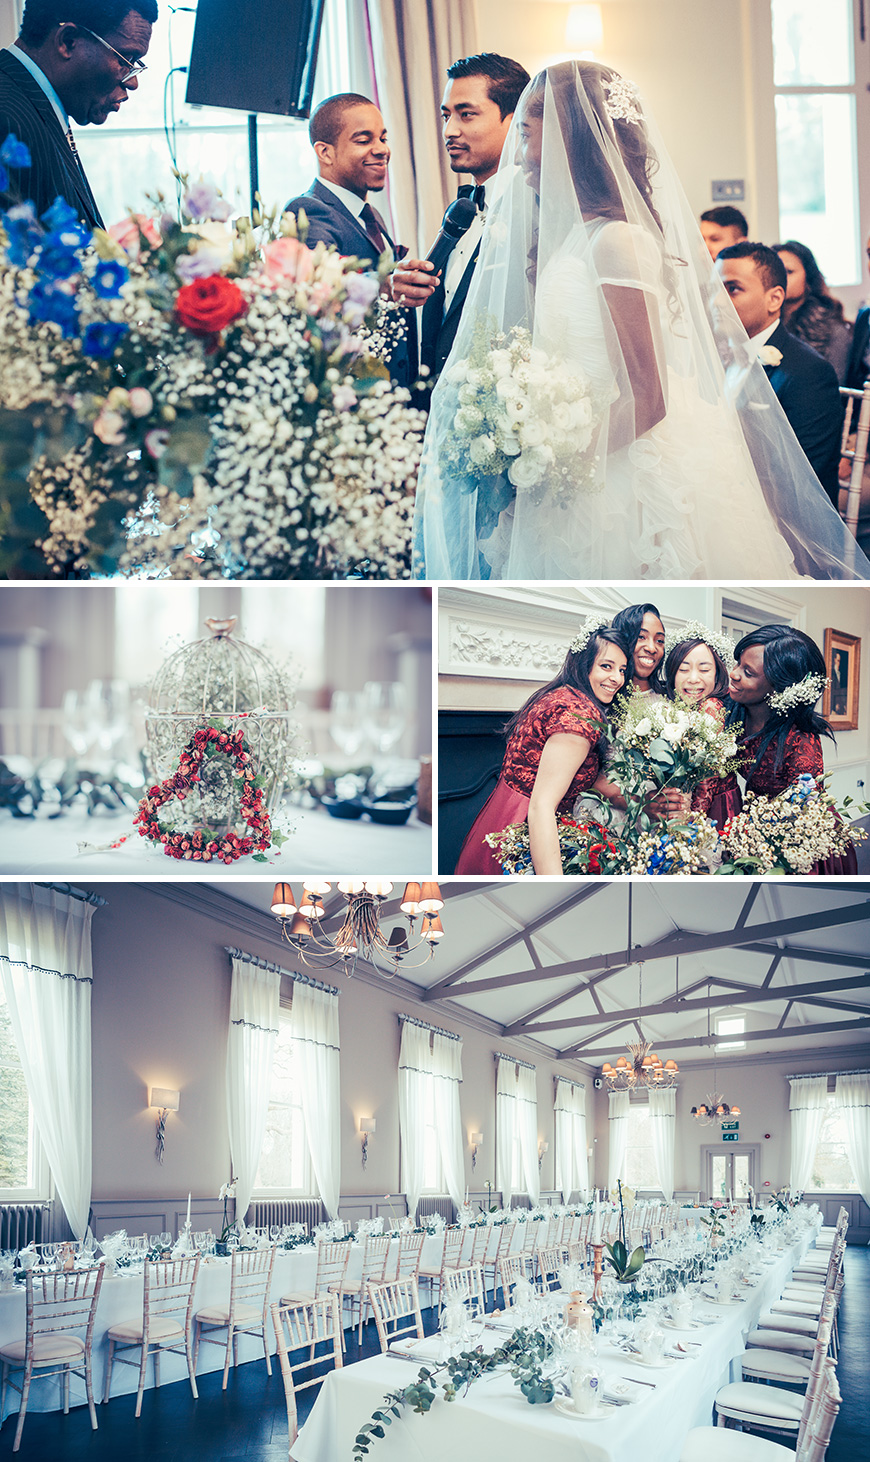 Angela and Praj's Handmade Wedding in London - Flowers | CHWV